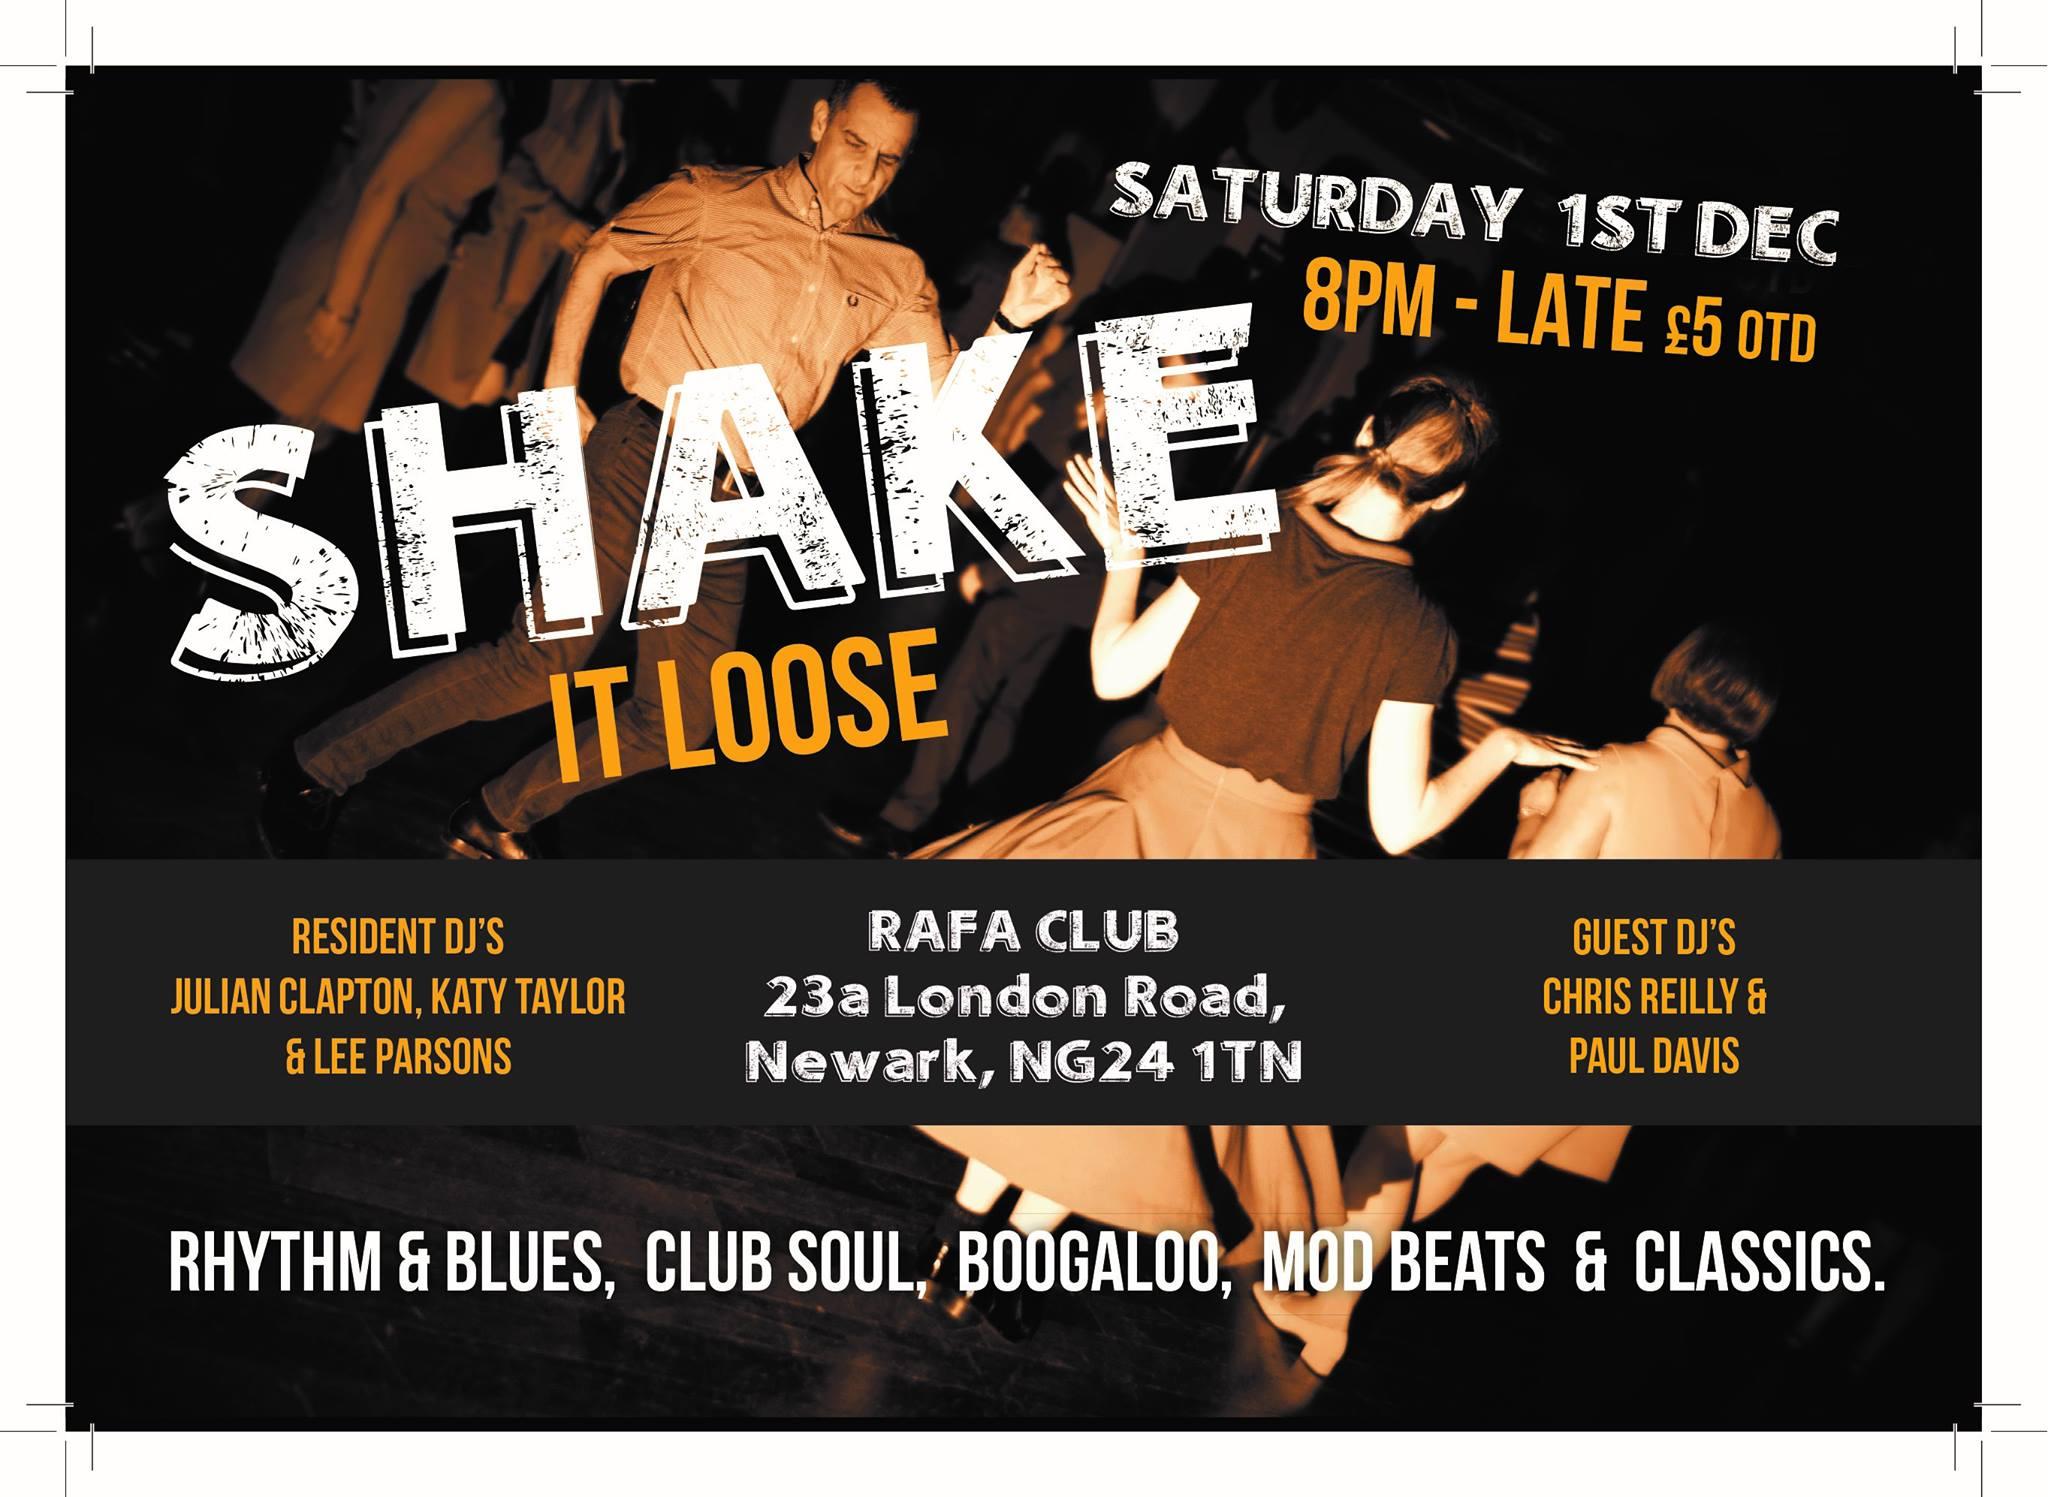 Shake It Loose - Newark, Nottinghamshire NG24 1TN - Guest DJs Paul Davis & Chris Riley & resident DJs Lee Parsons, Katy Taylor & Julian Clapton. 60s Soul, vintage & 60s R&B, Booglaoo & Mod. 01/12/18